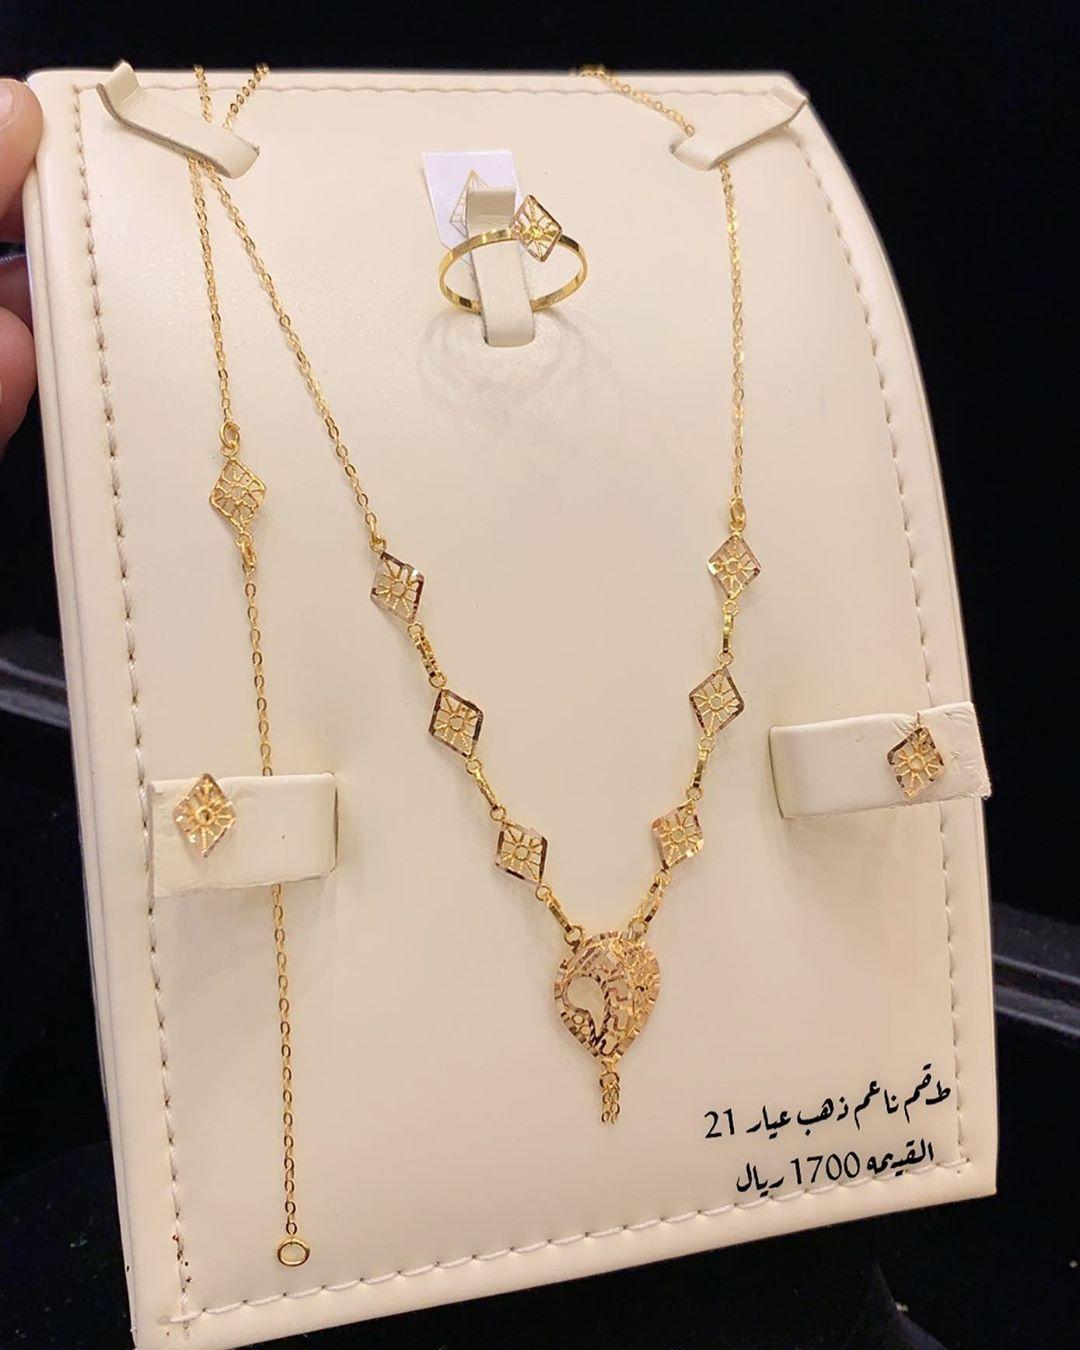 Mi Piace 207 Commenti 1 مجوهرات تاج العروس 1 Tajalaros 1 Su Instagram مجوهرات الوفاء موقعنا المملكه العربية ا Gold Jewelry Jewell Jewelry